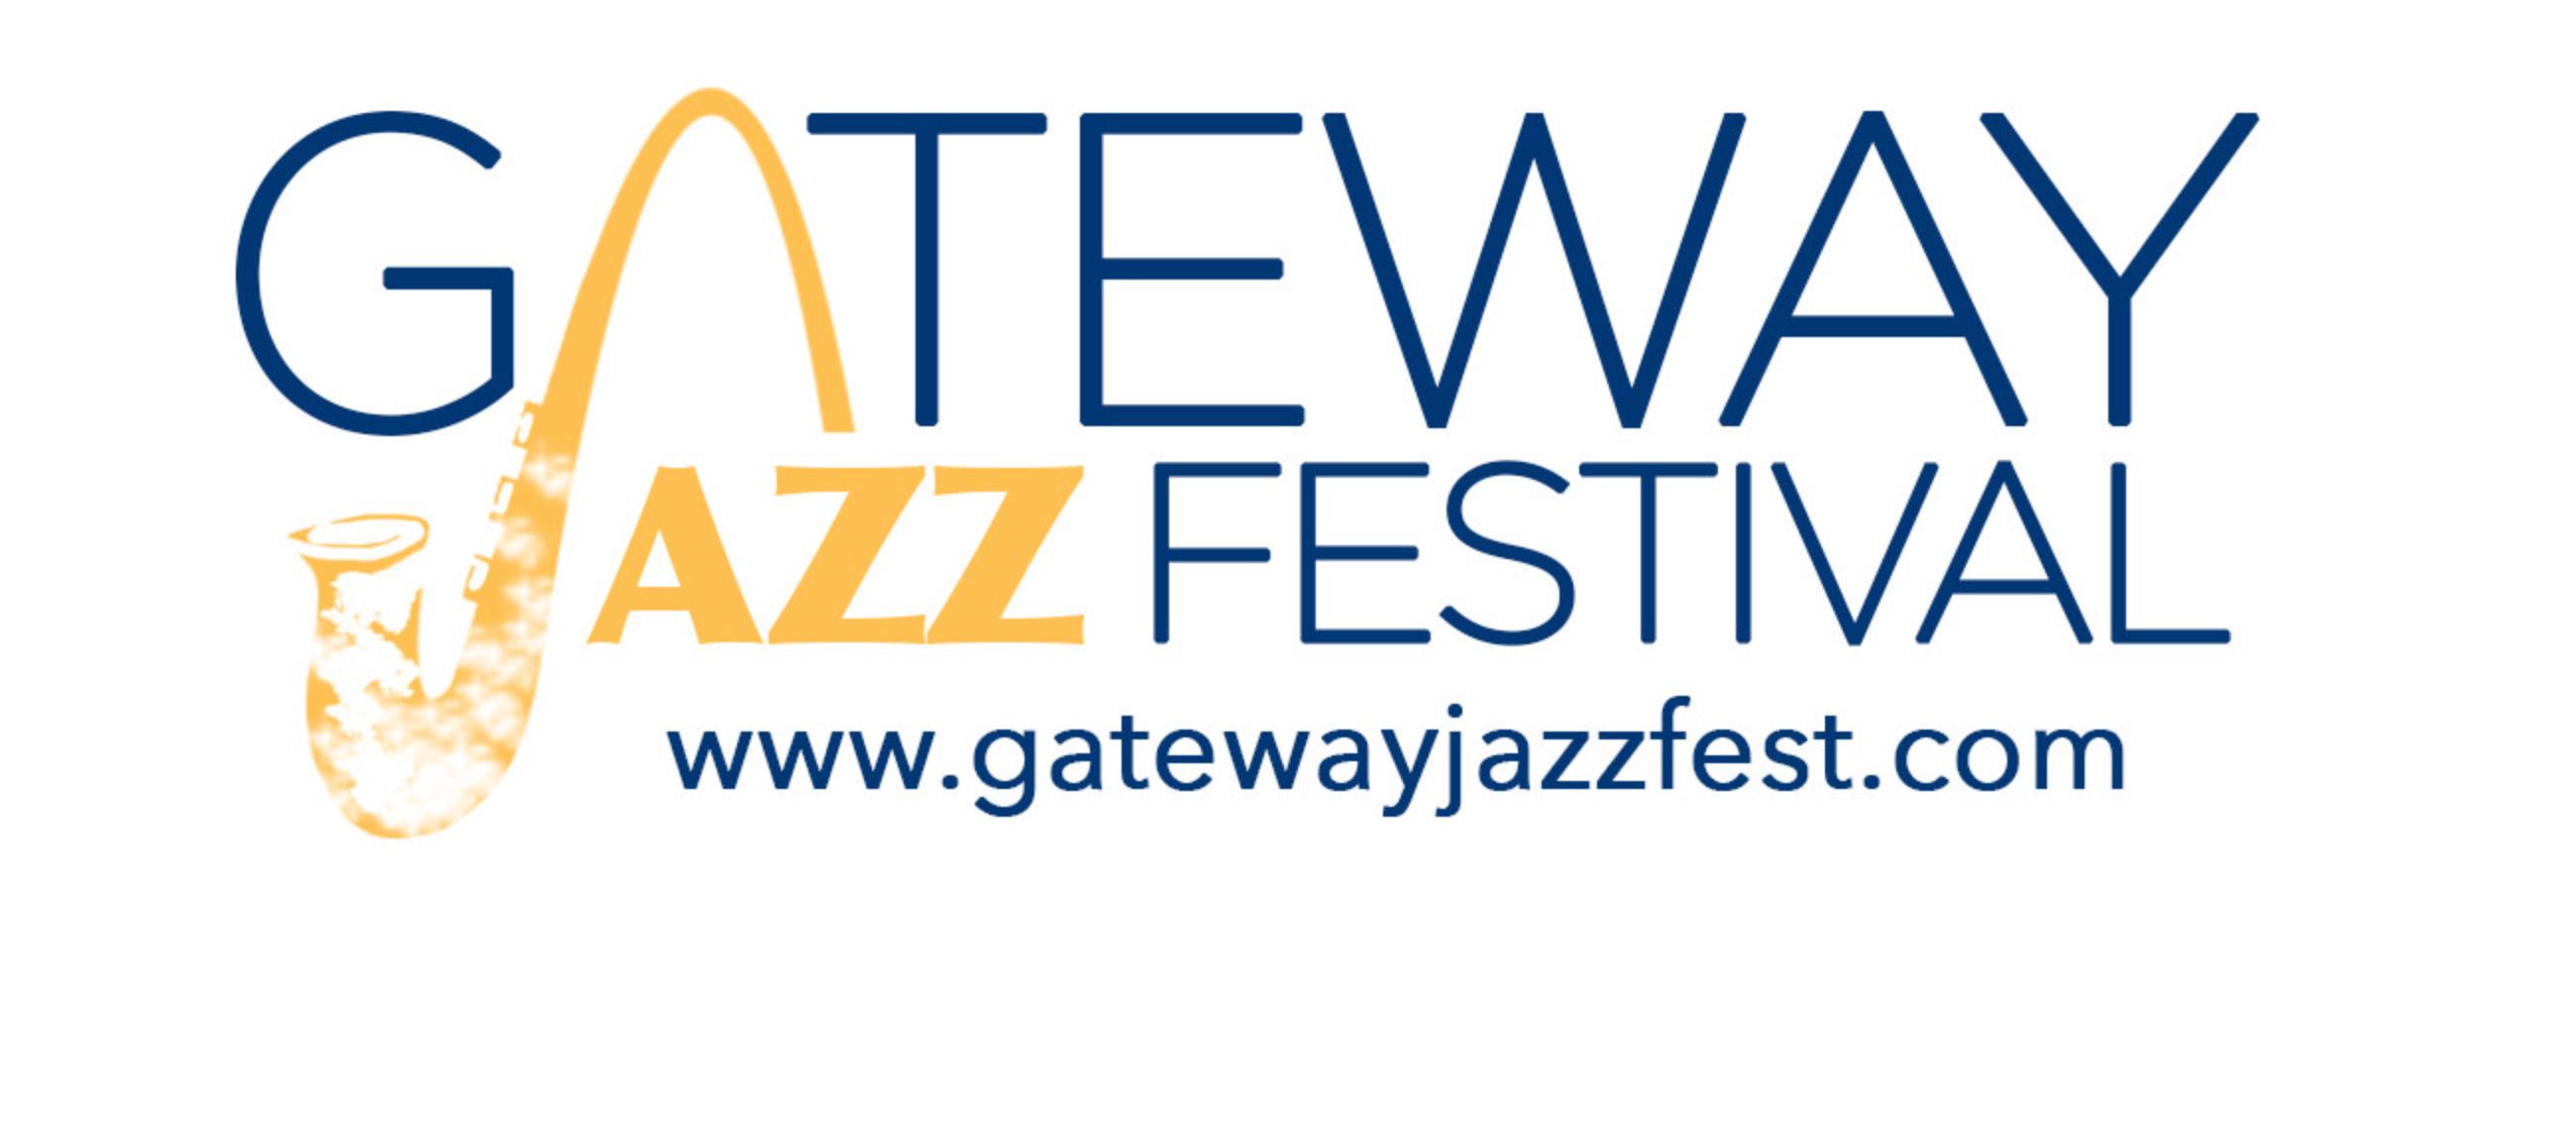 2017 Gateway Jazz Festival